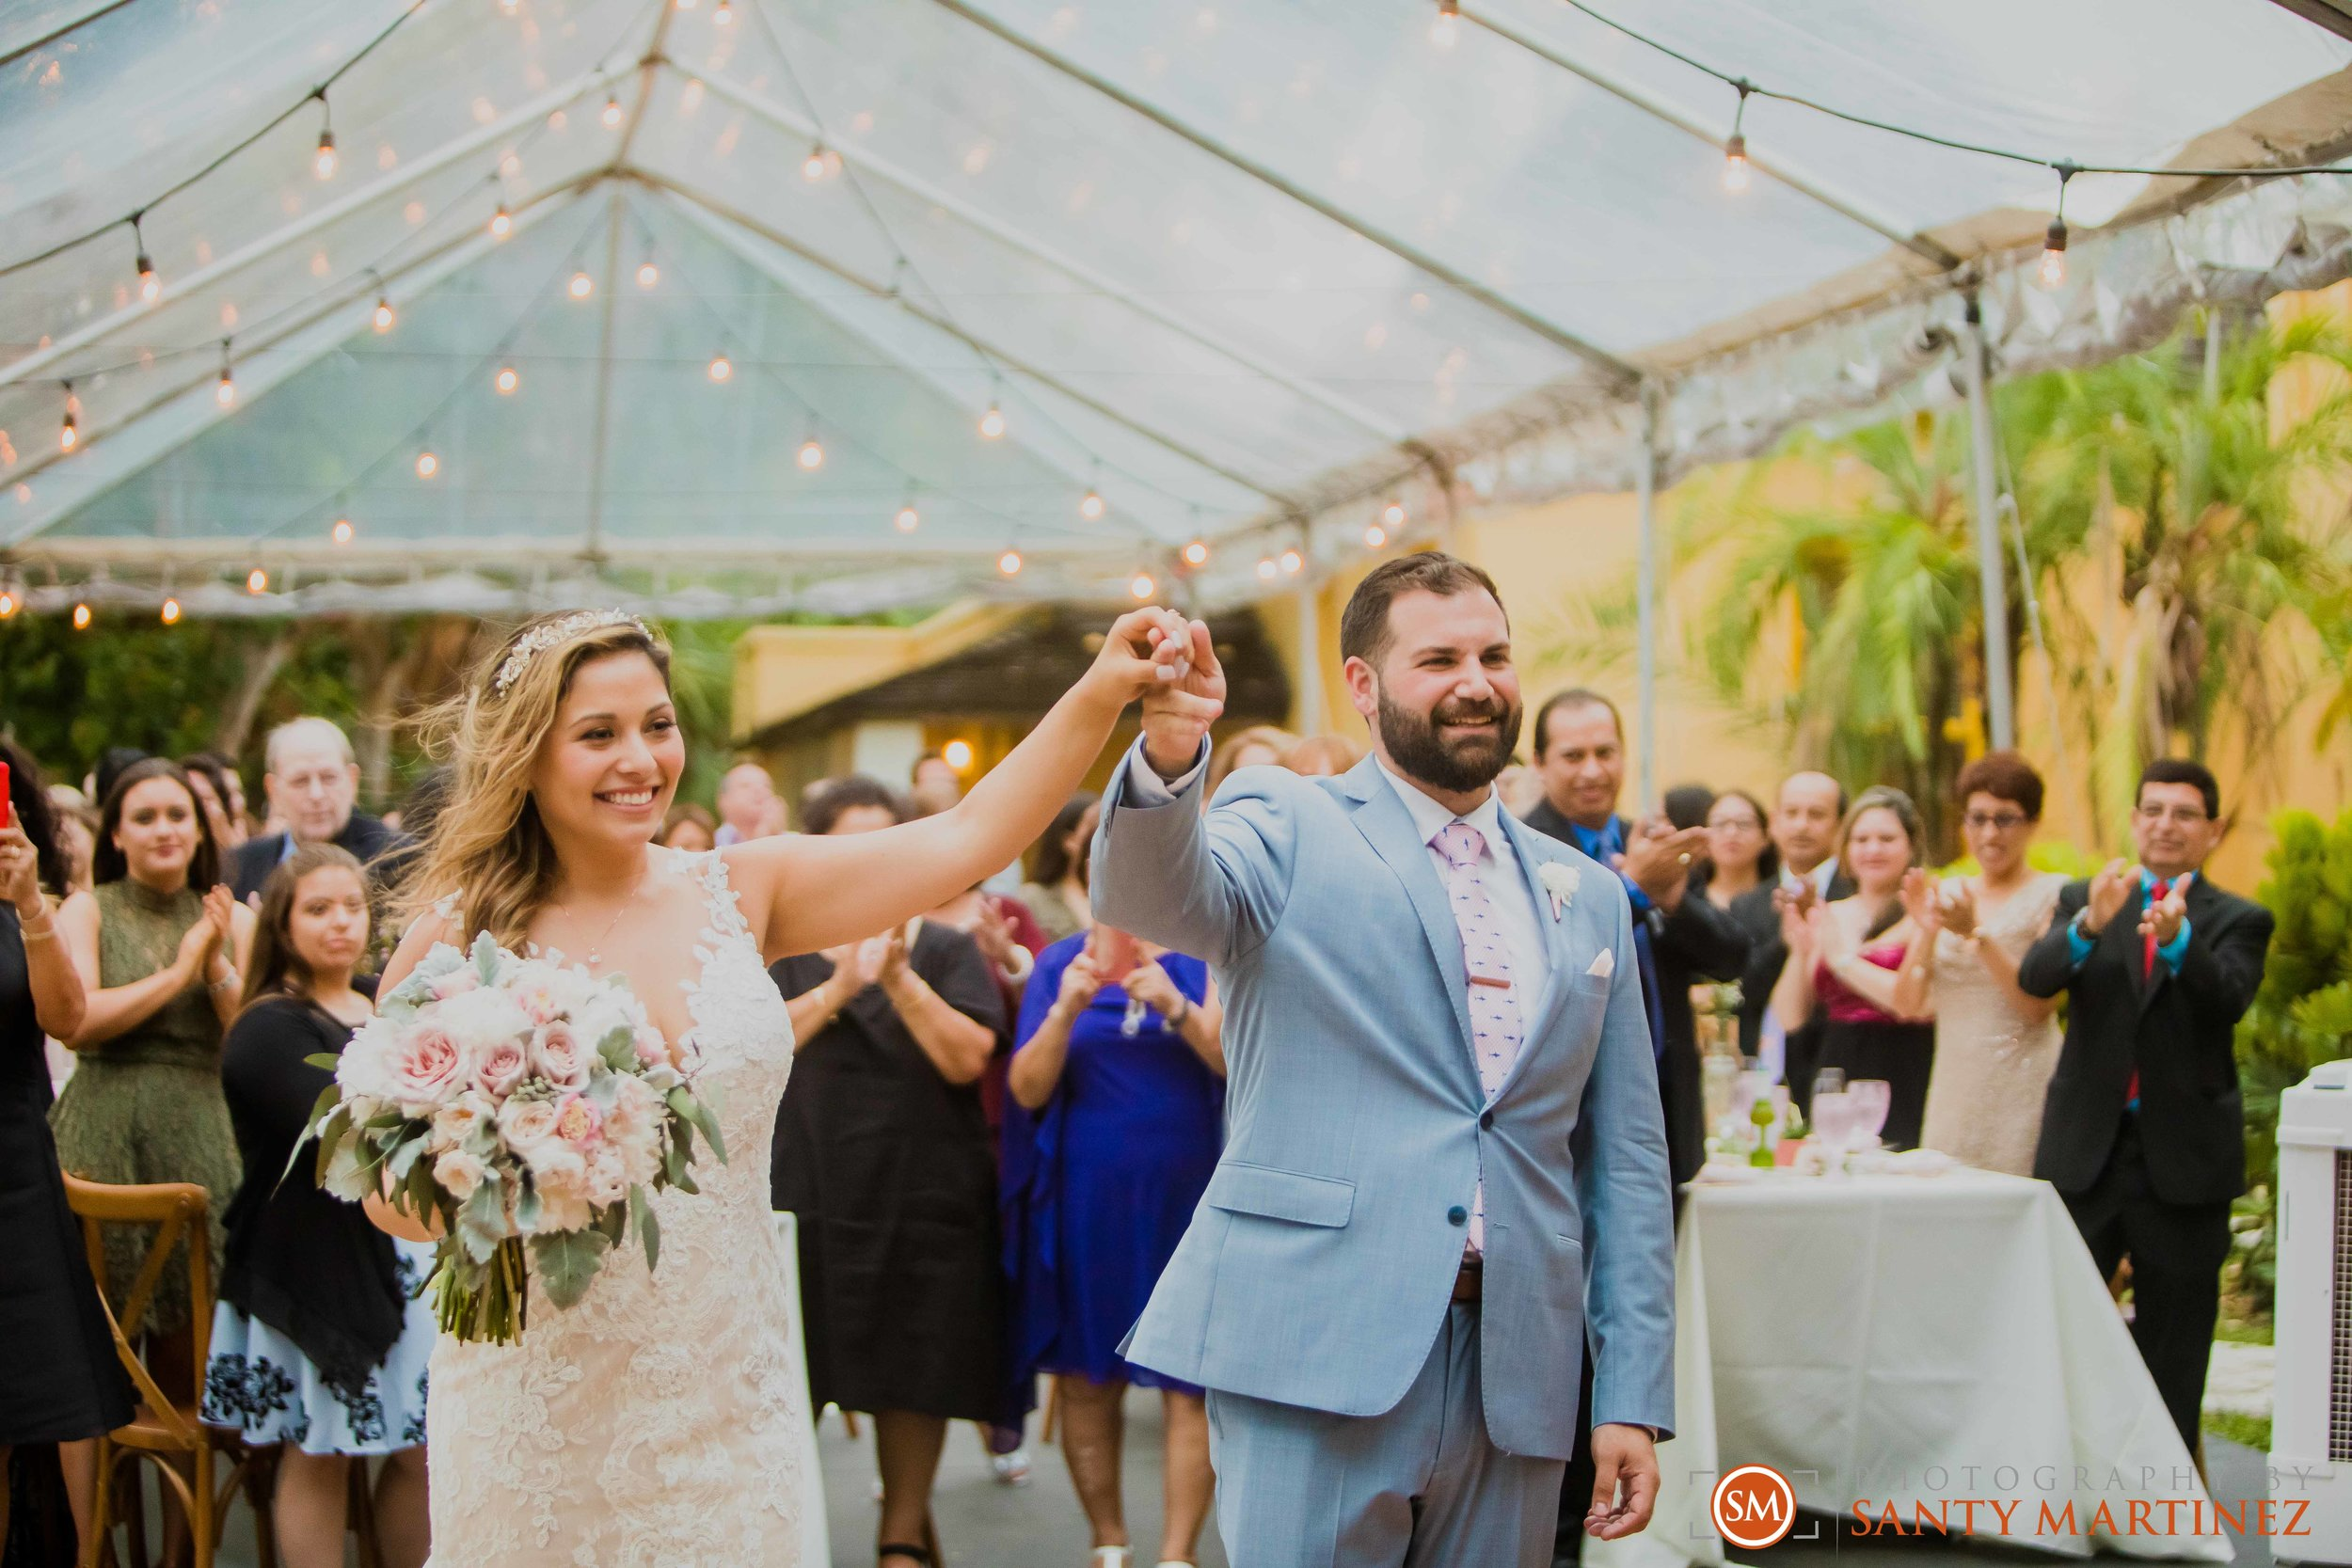 Wedding Bonnet House - Santy Martinez Photography-53.jpg